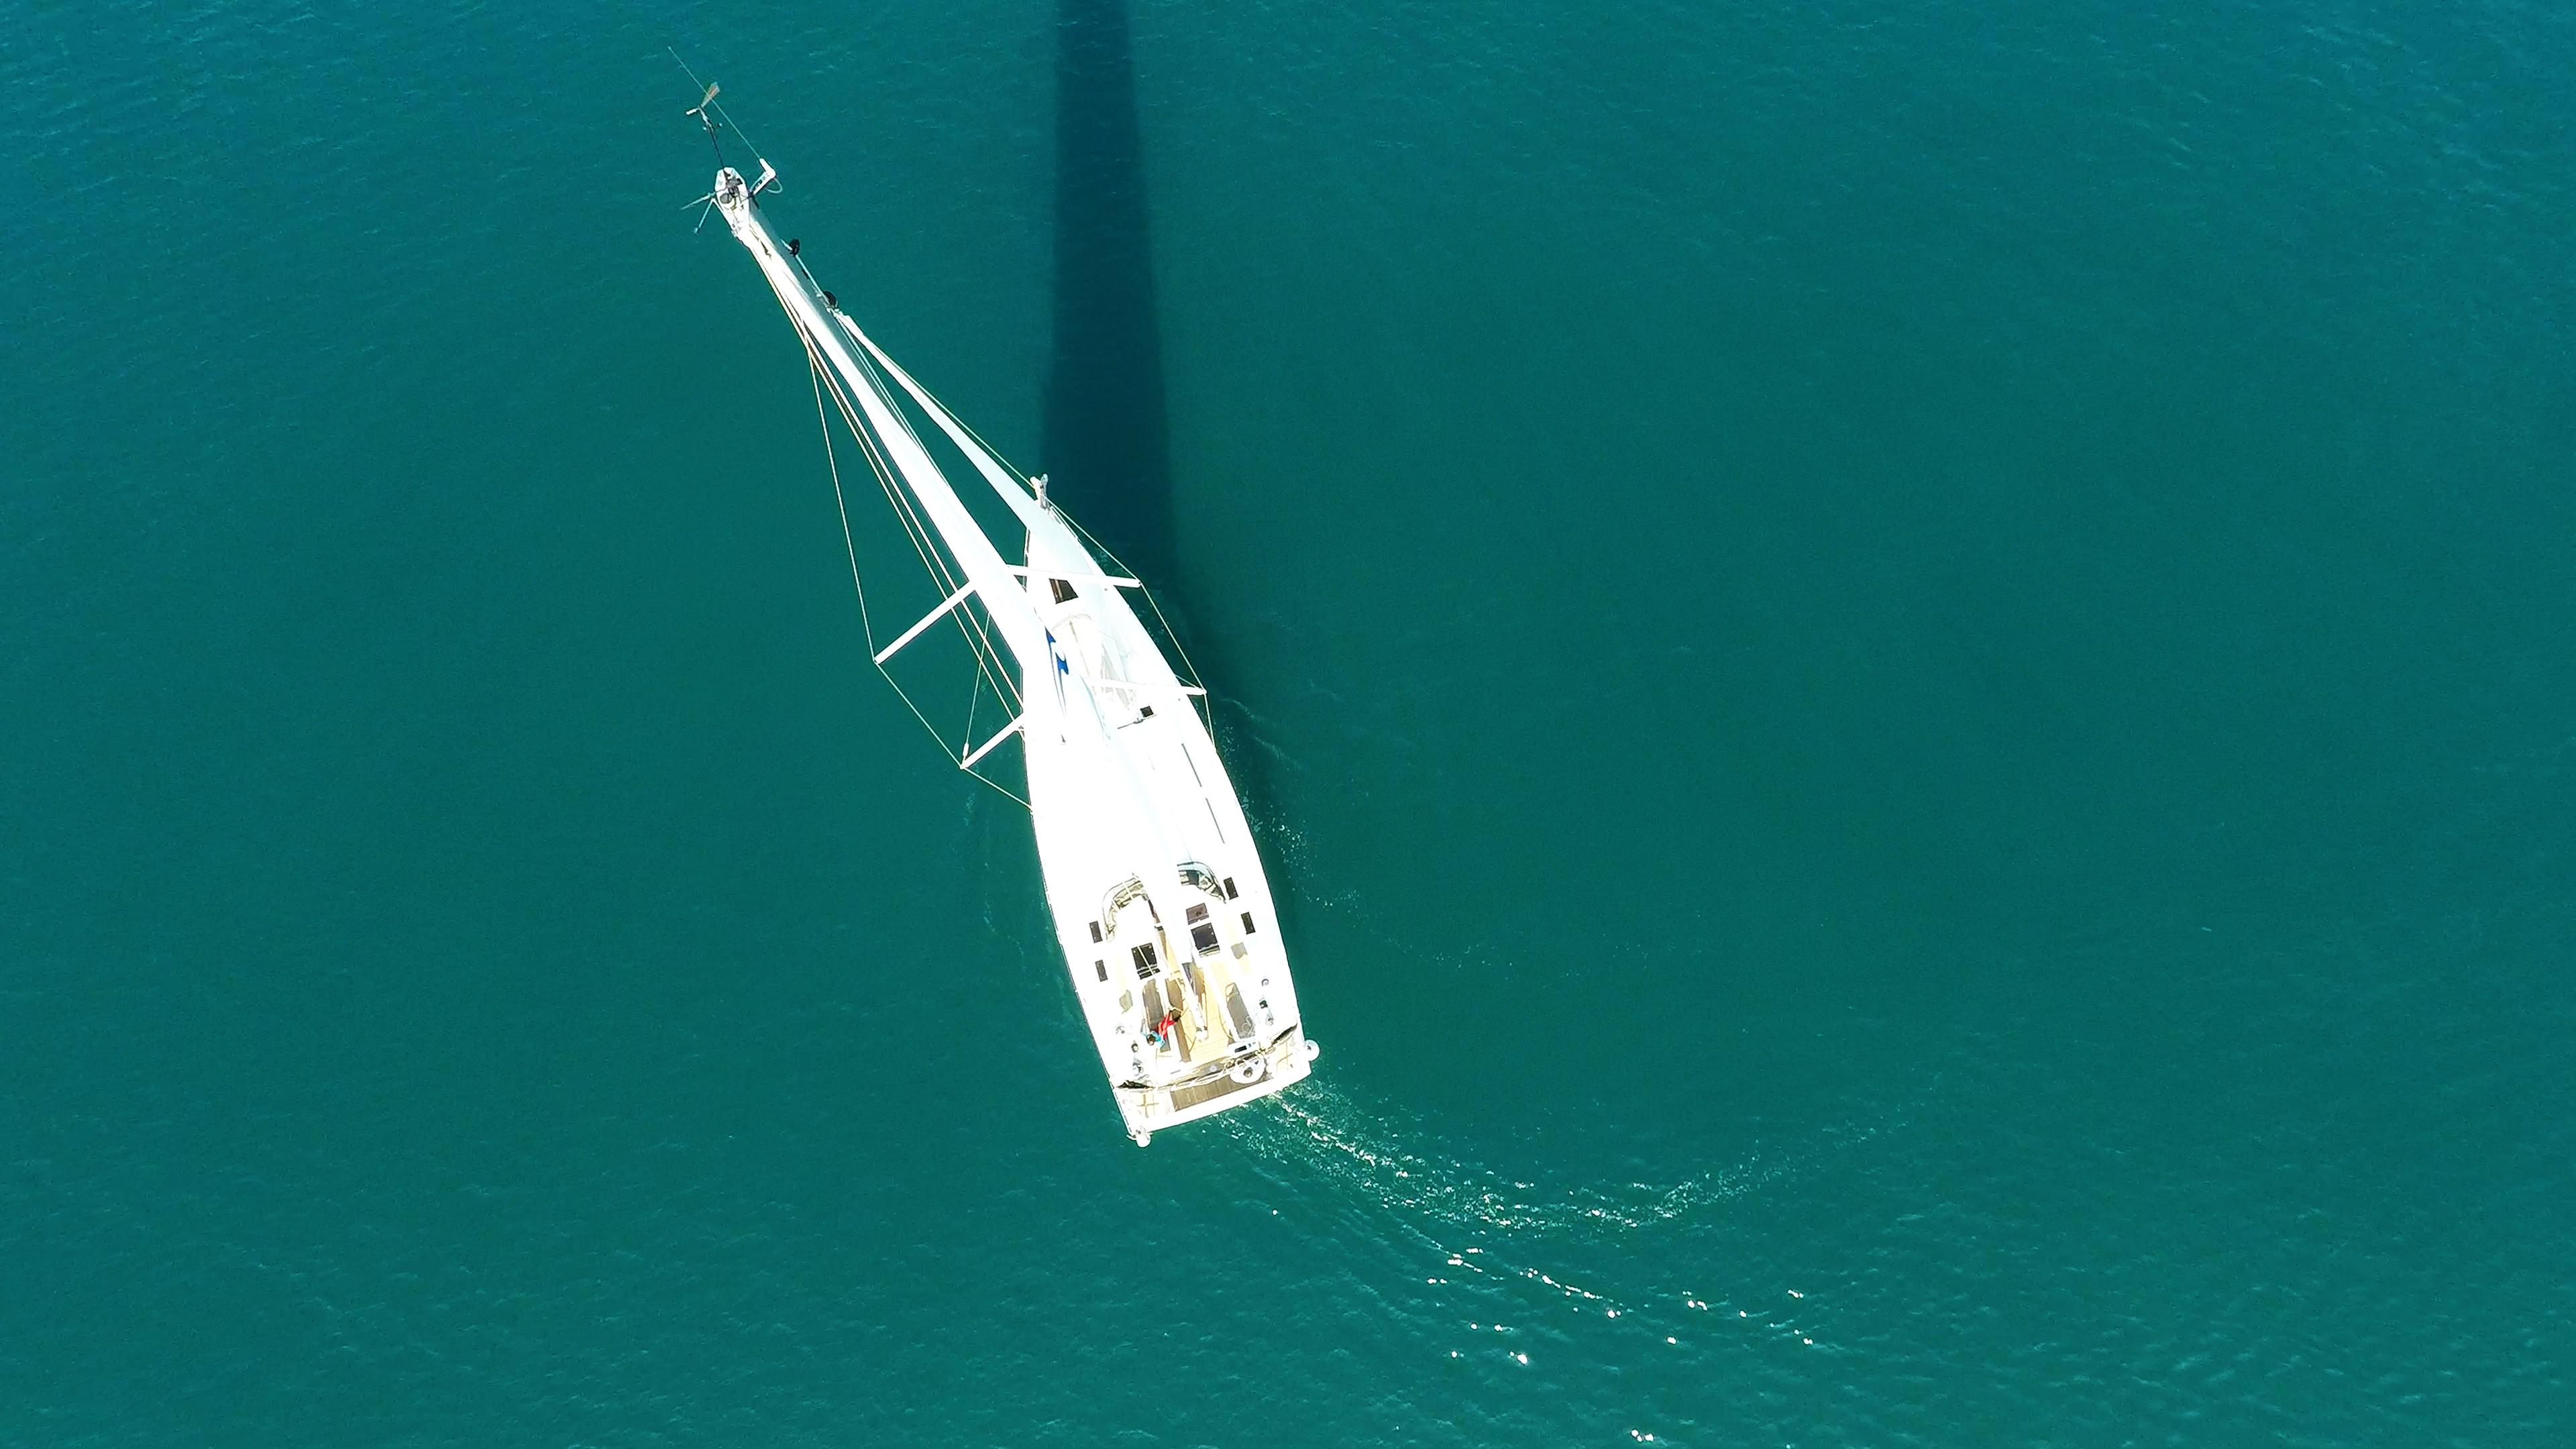 barcha a vela barca a vela Hanse 505 dall'aria nadir vista verticalee vele ponte albero sartiame